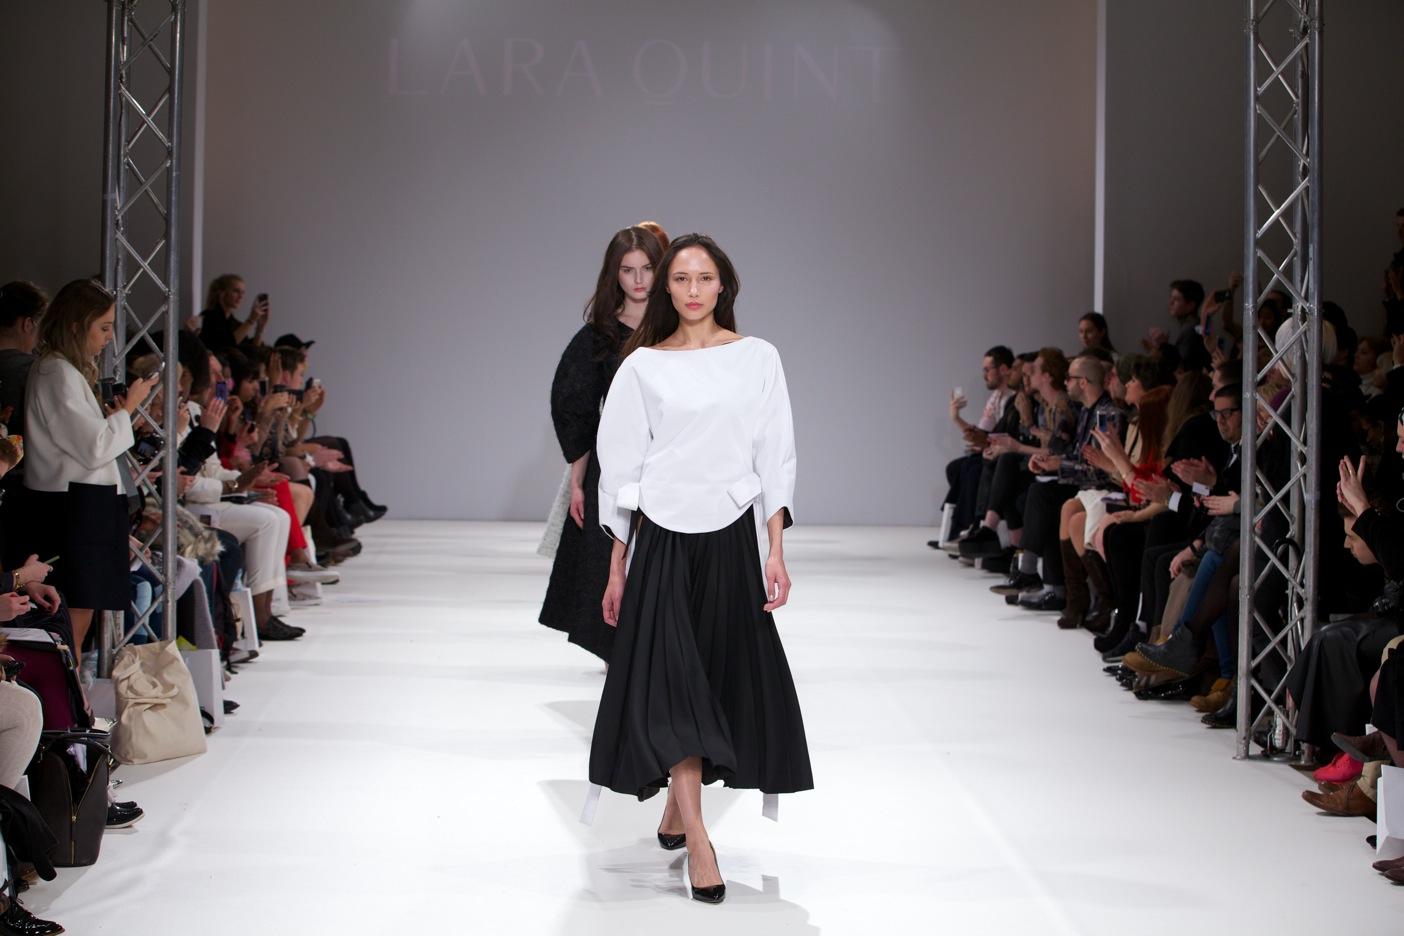 Kiev Fashion Days A-W 2014 (c) Marc aitken 2014  30.jpg